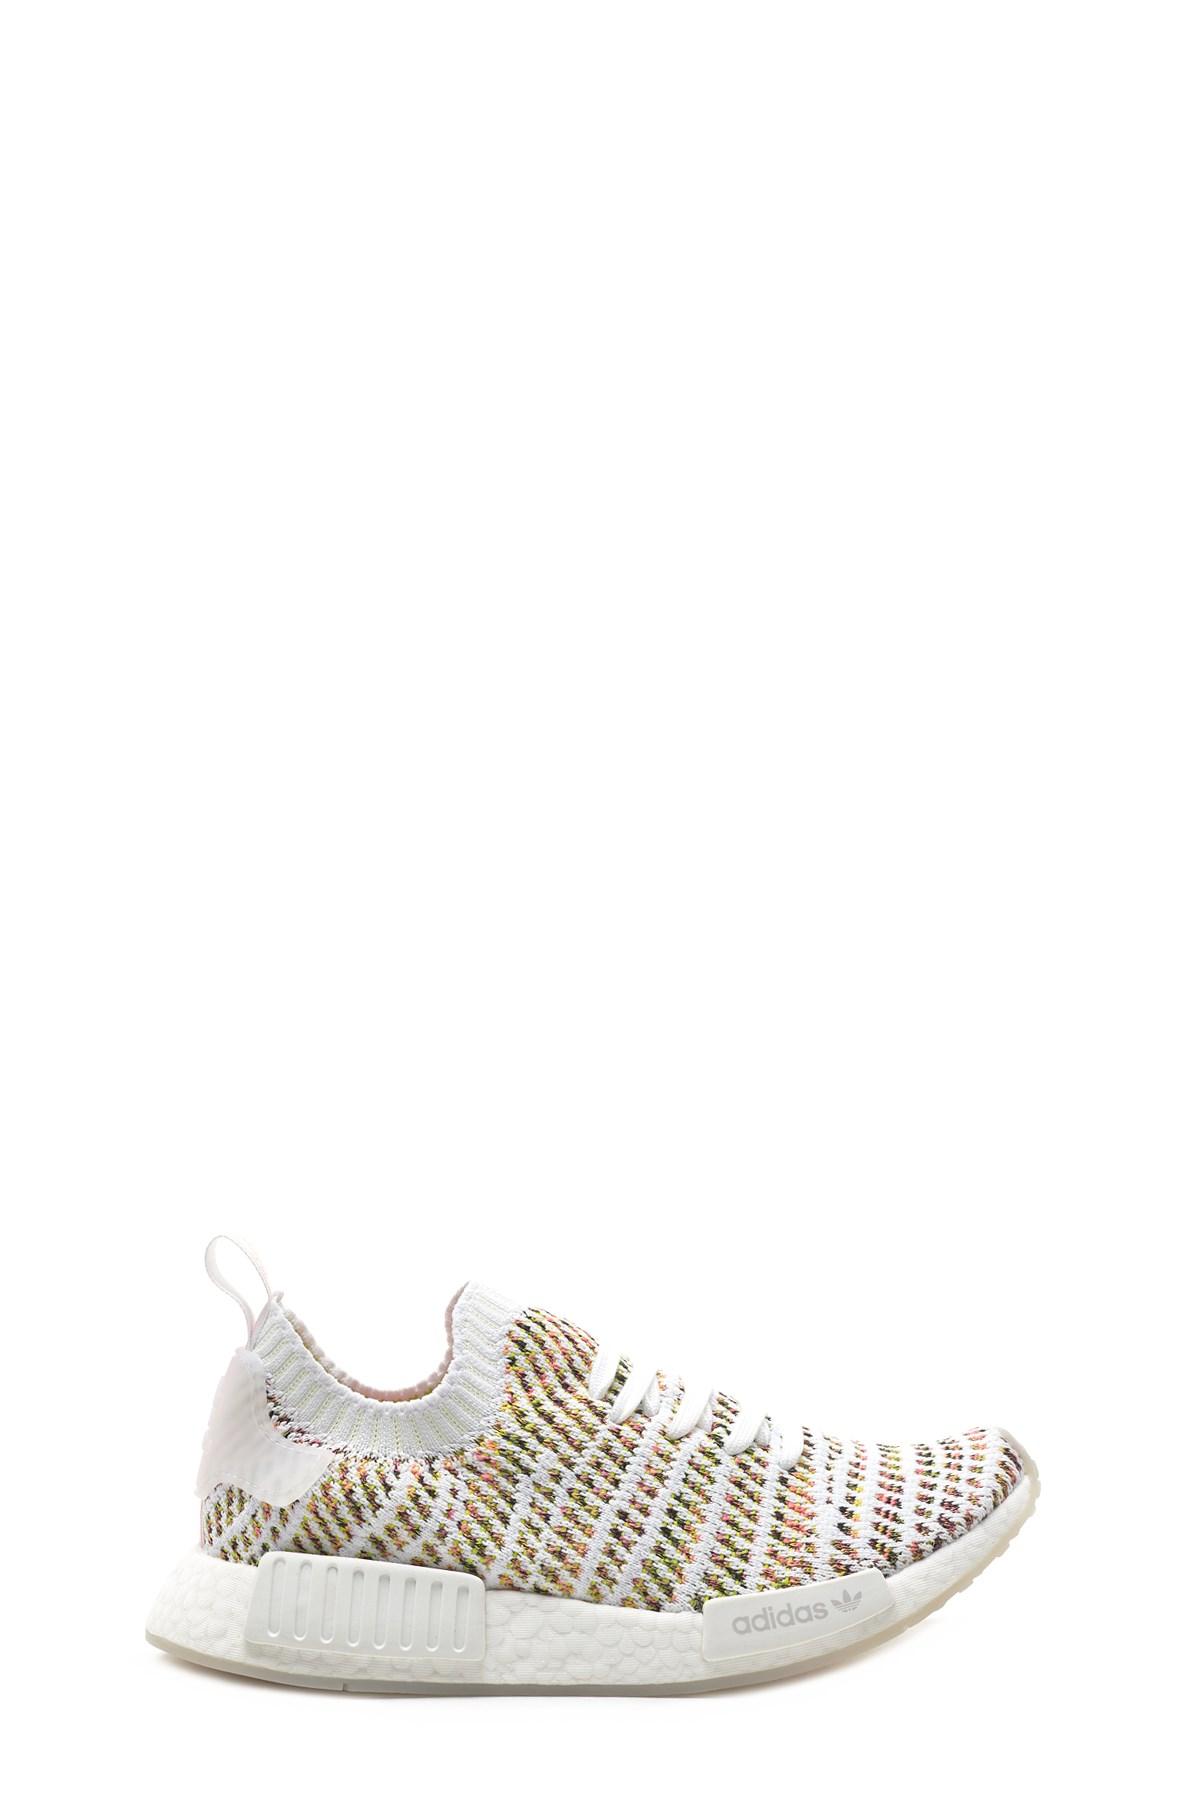 uk availability fec0c 0ac3b 'nmd r1' sneakers